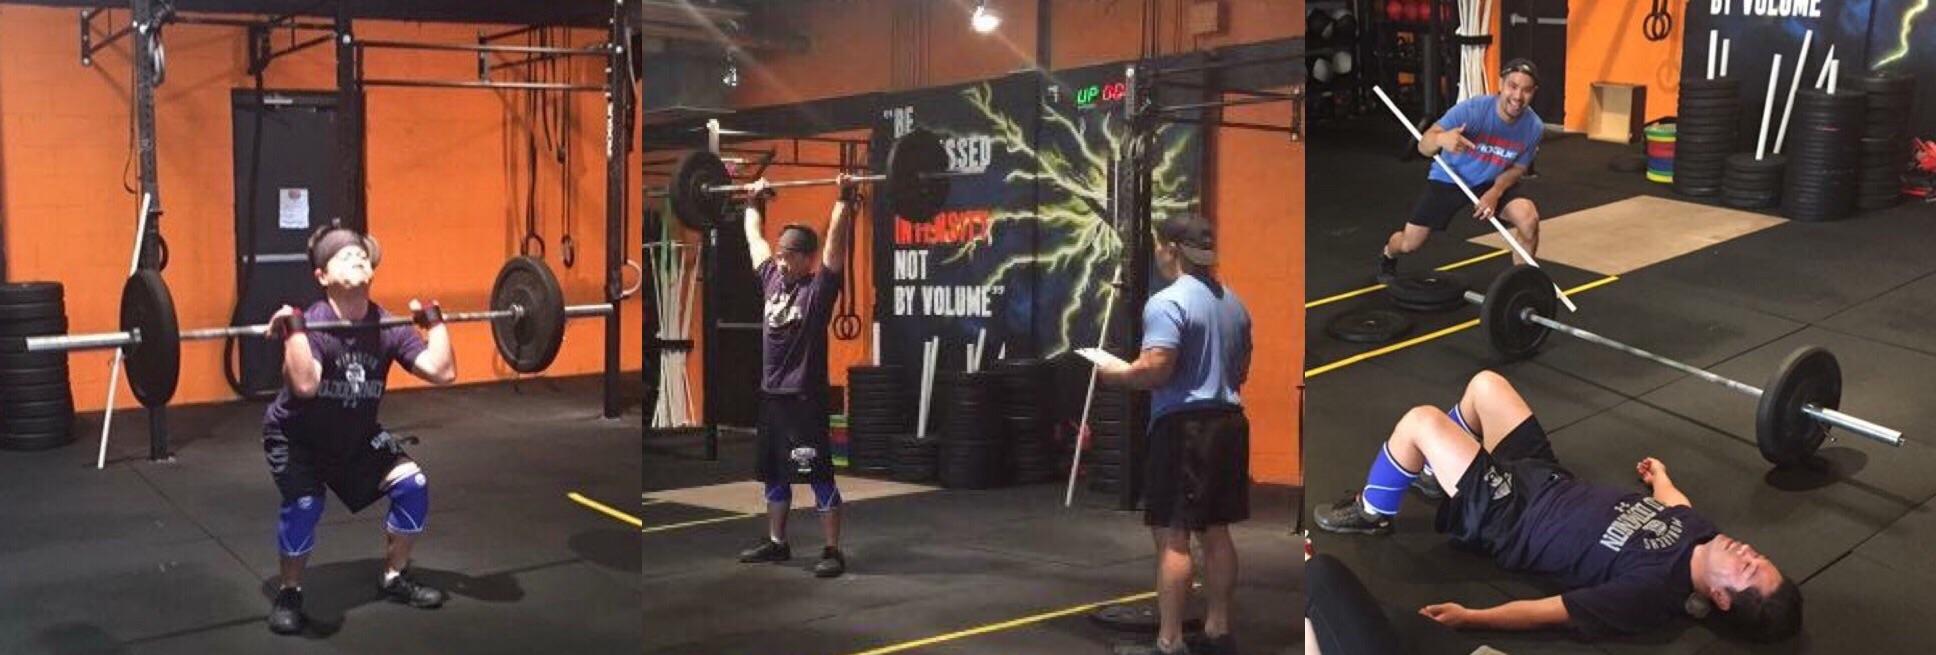 CrossFit Open 2016, Workout 16.5